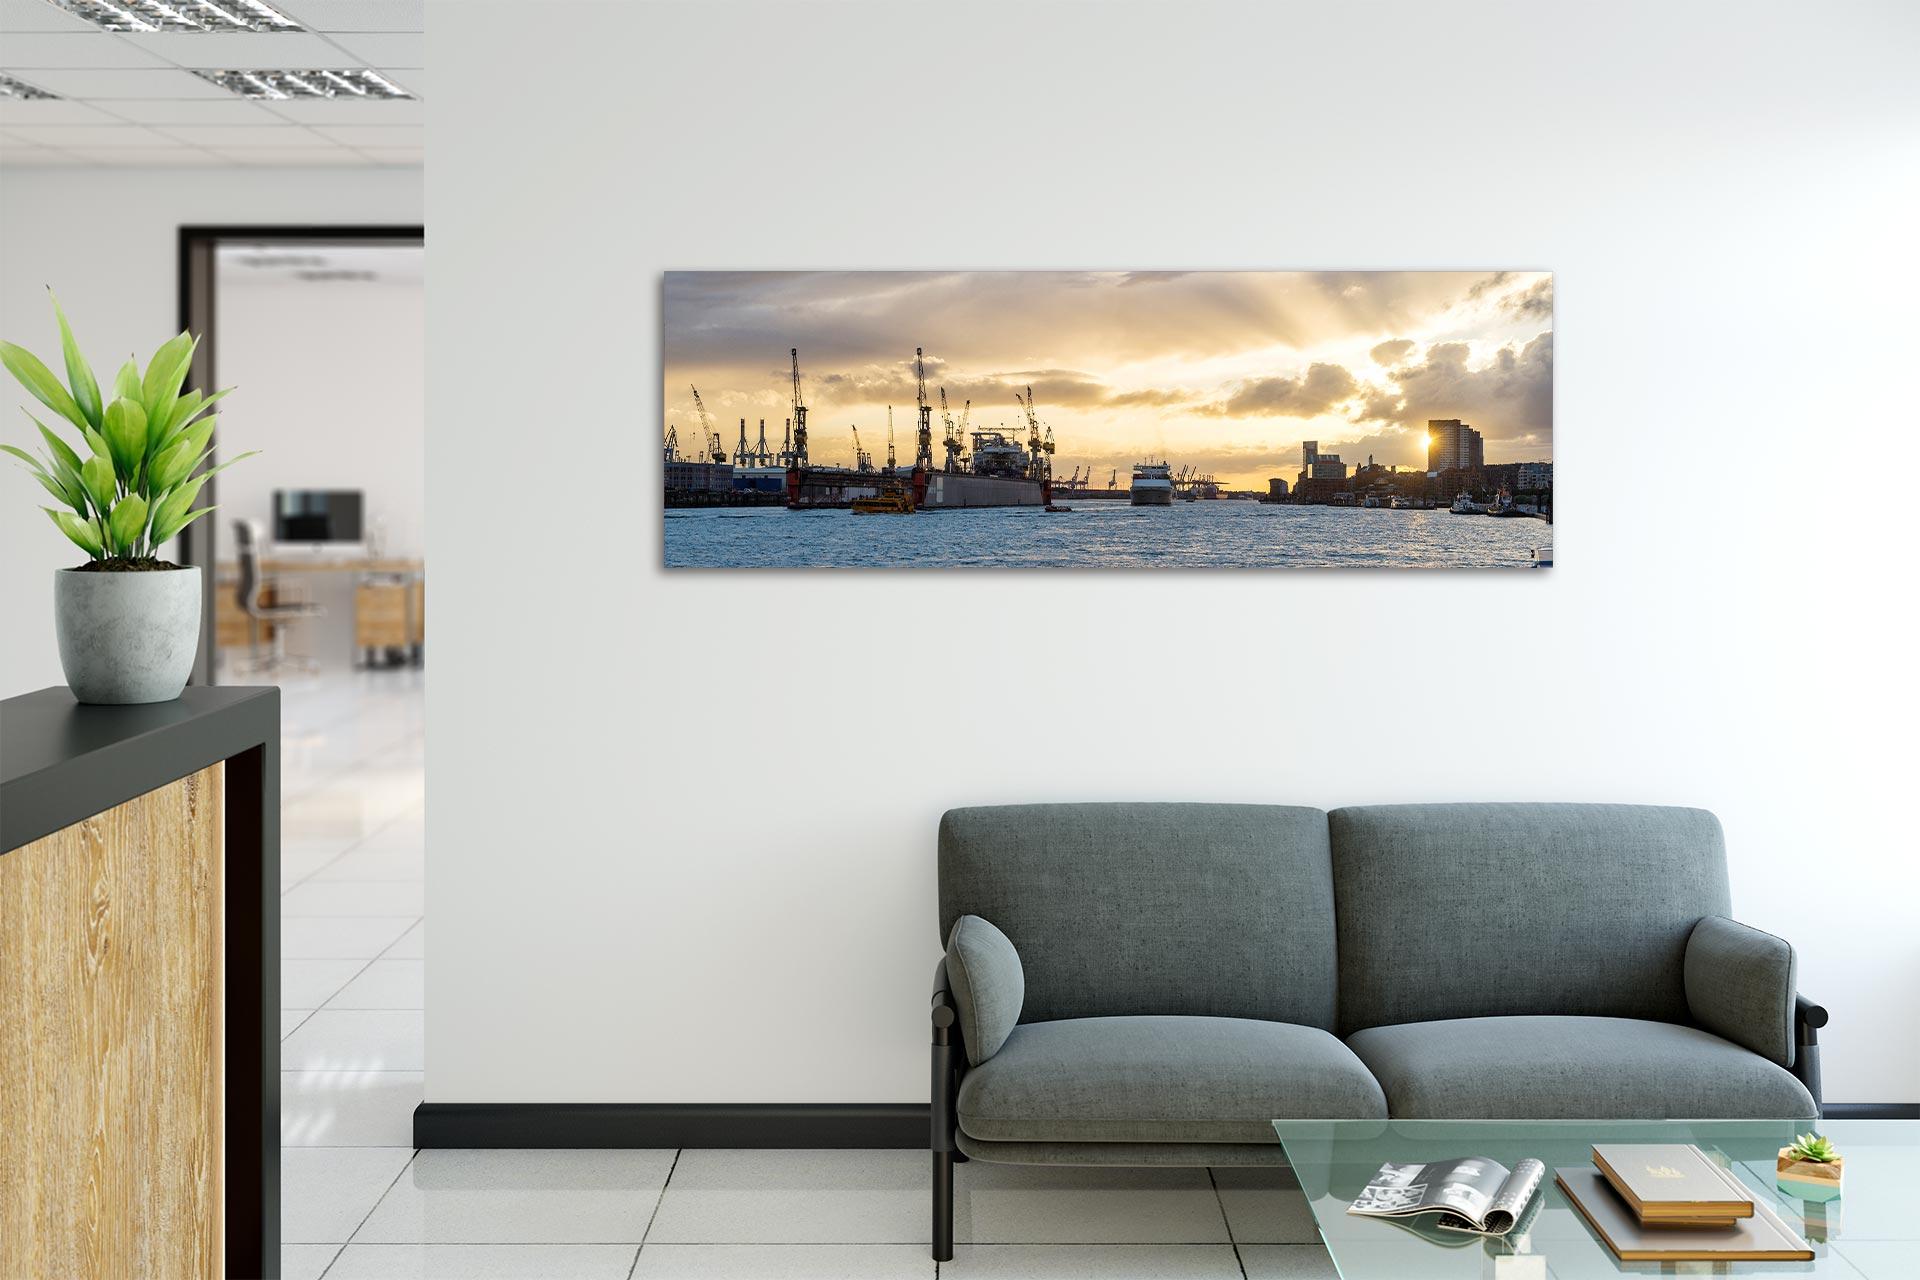 PSW045-panorama-hamburg-hafen-leinwand-acrylglas-aludibond-empfang